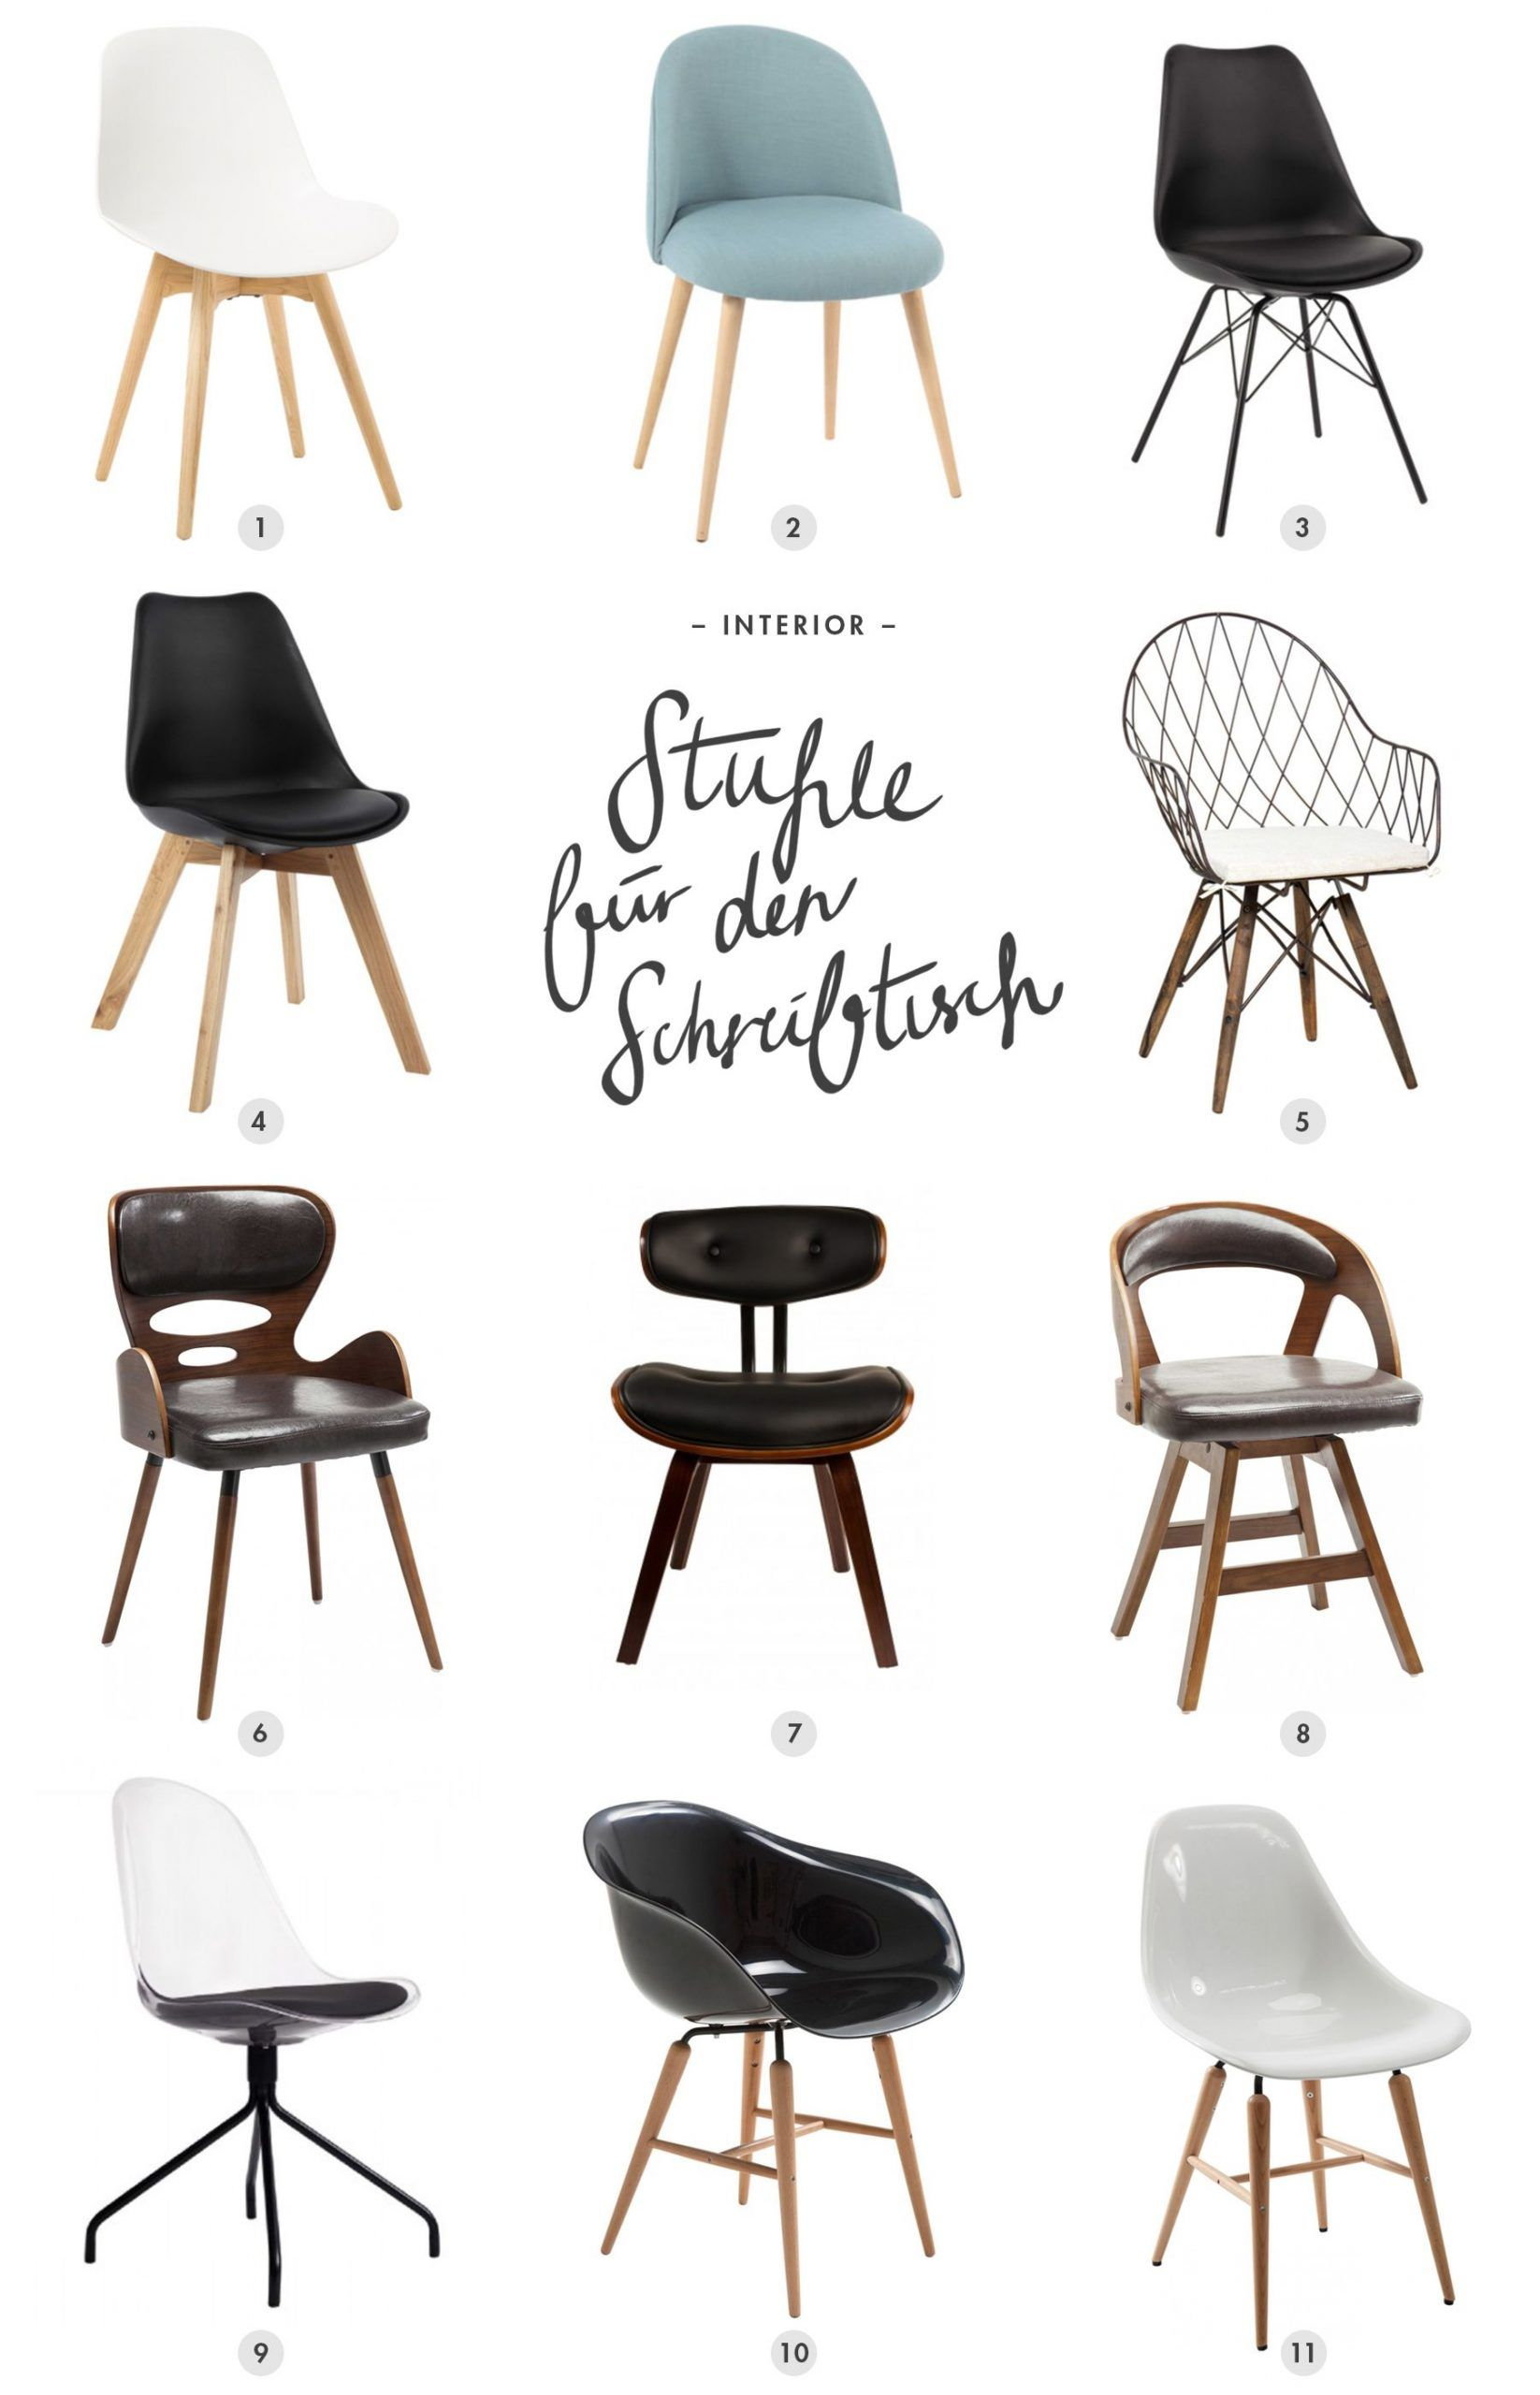 11 Schone Stuhle Fur Den Schreibtisch Office Chair Interiordesign Interio Haus Deko Zimmer Dekor Ideen Mobelideen